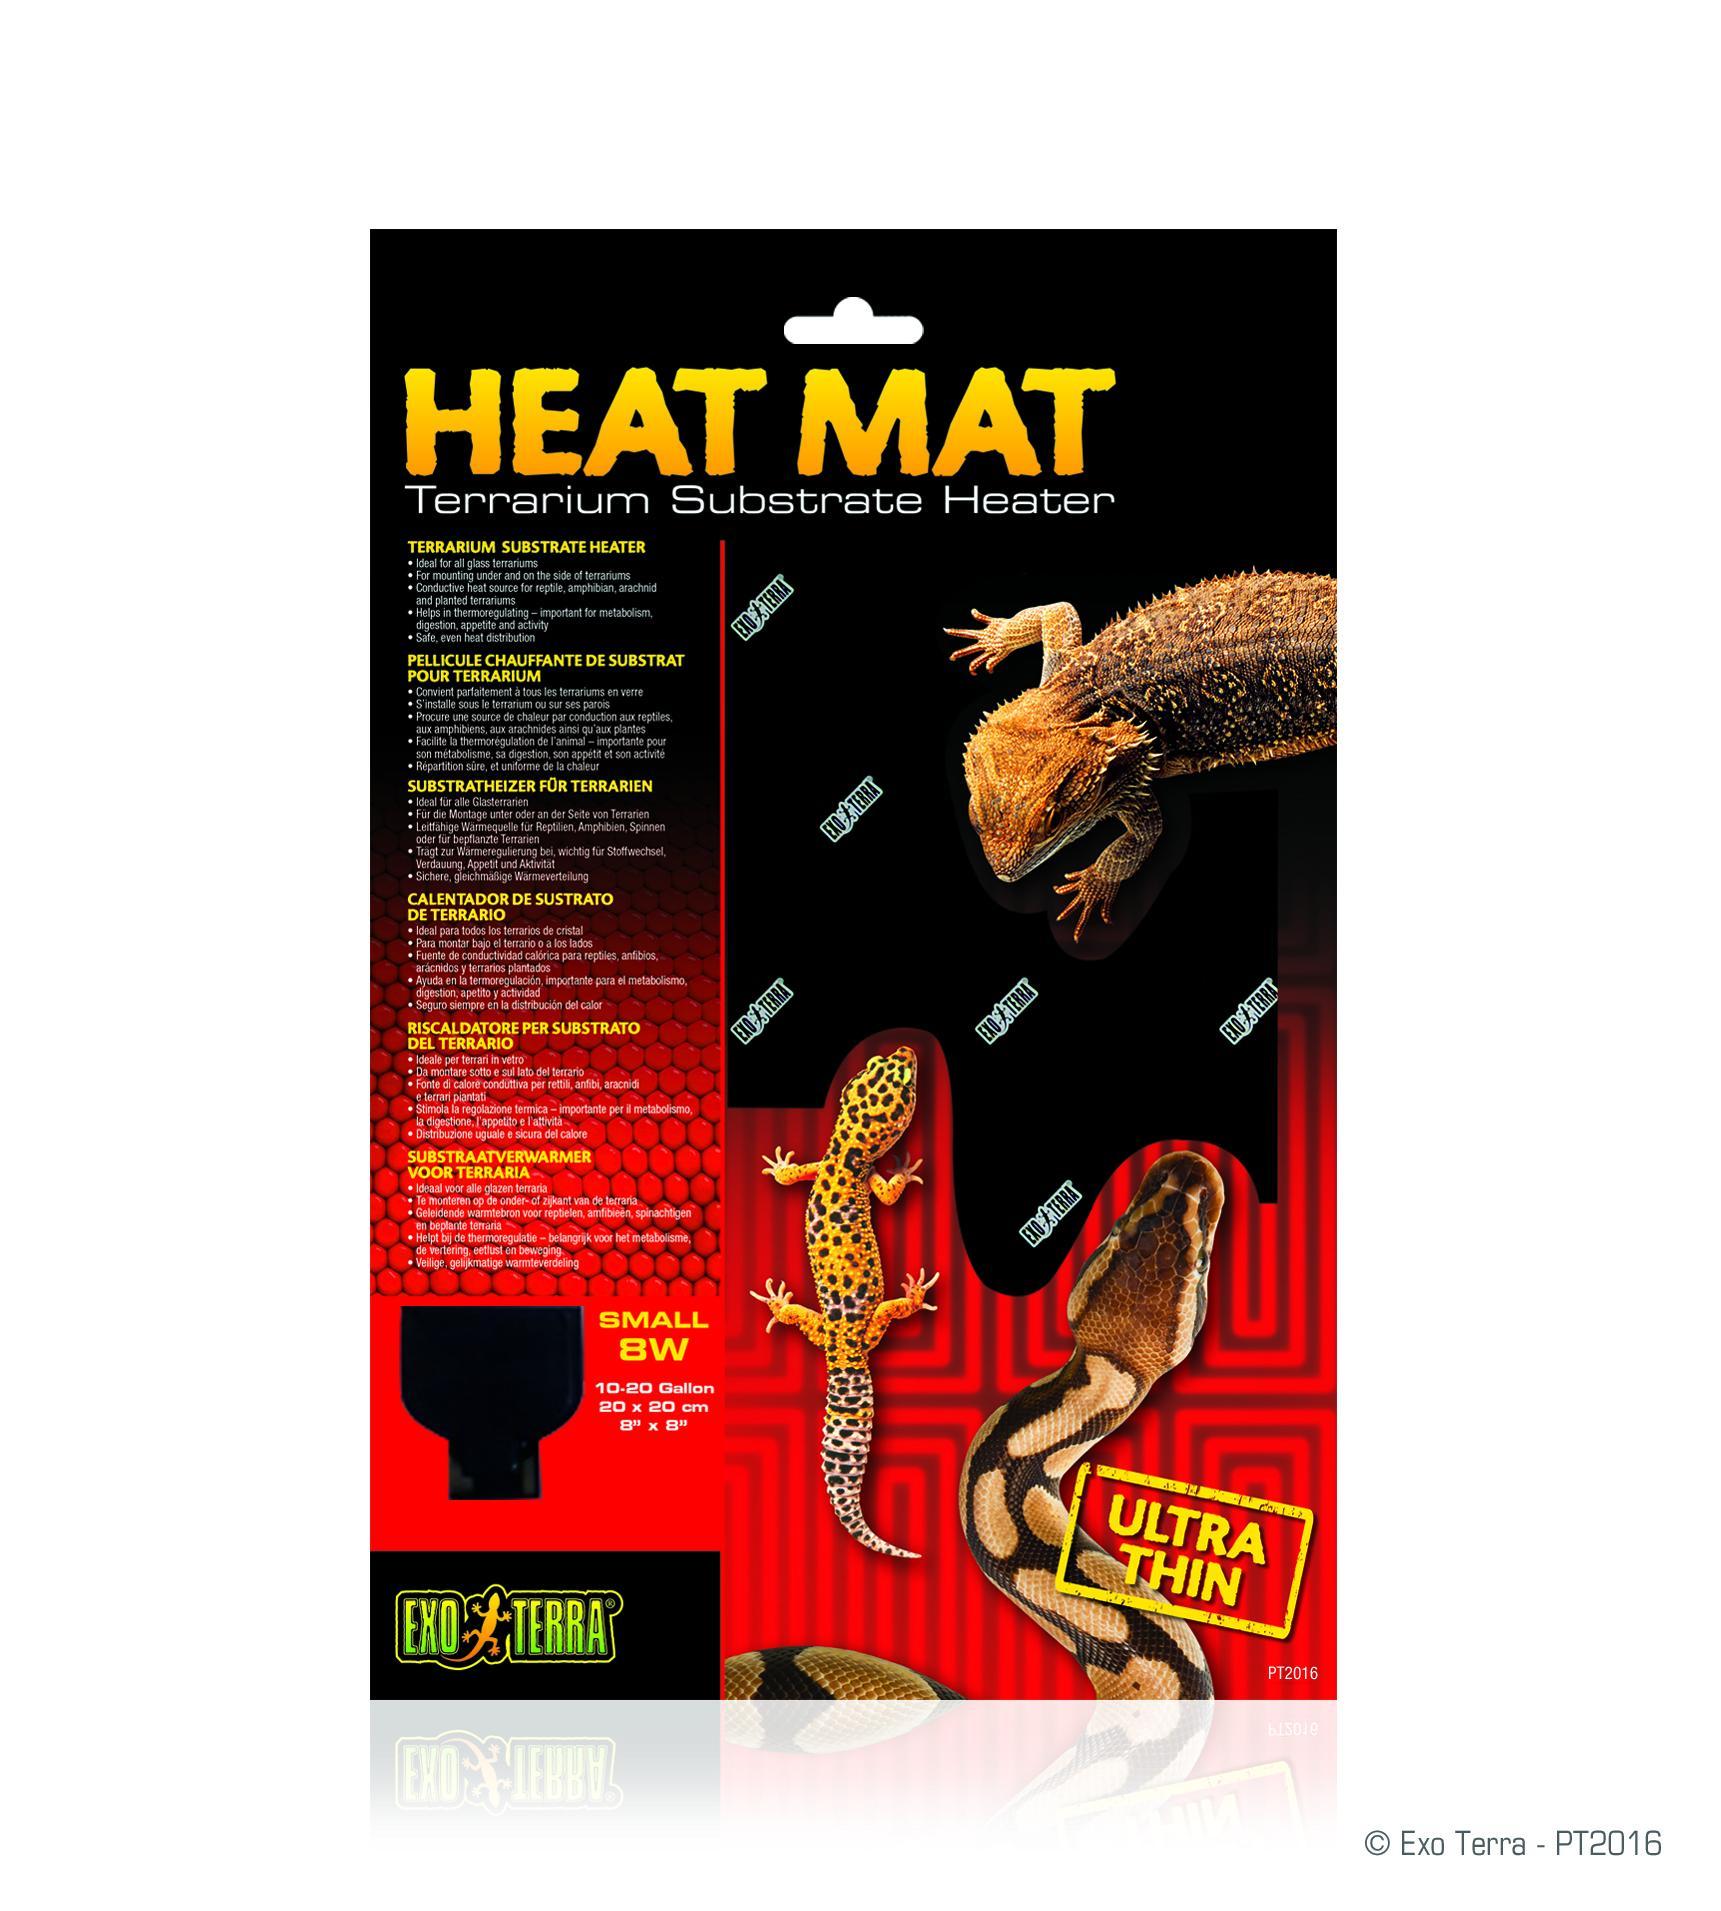 Exo Terra Ultra Thin Terrarium Substrate Heat Mat, 8-watt